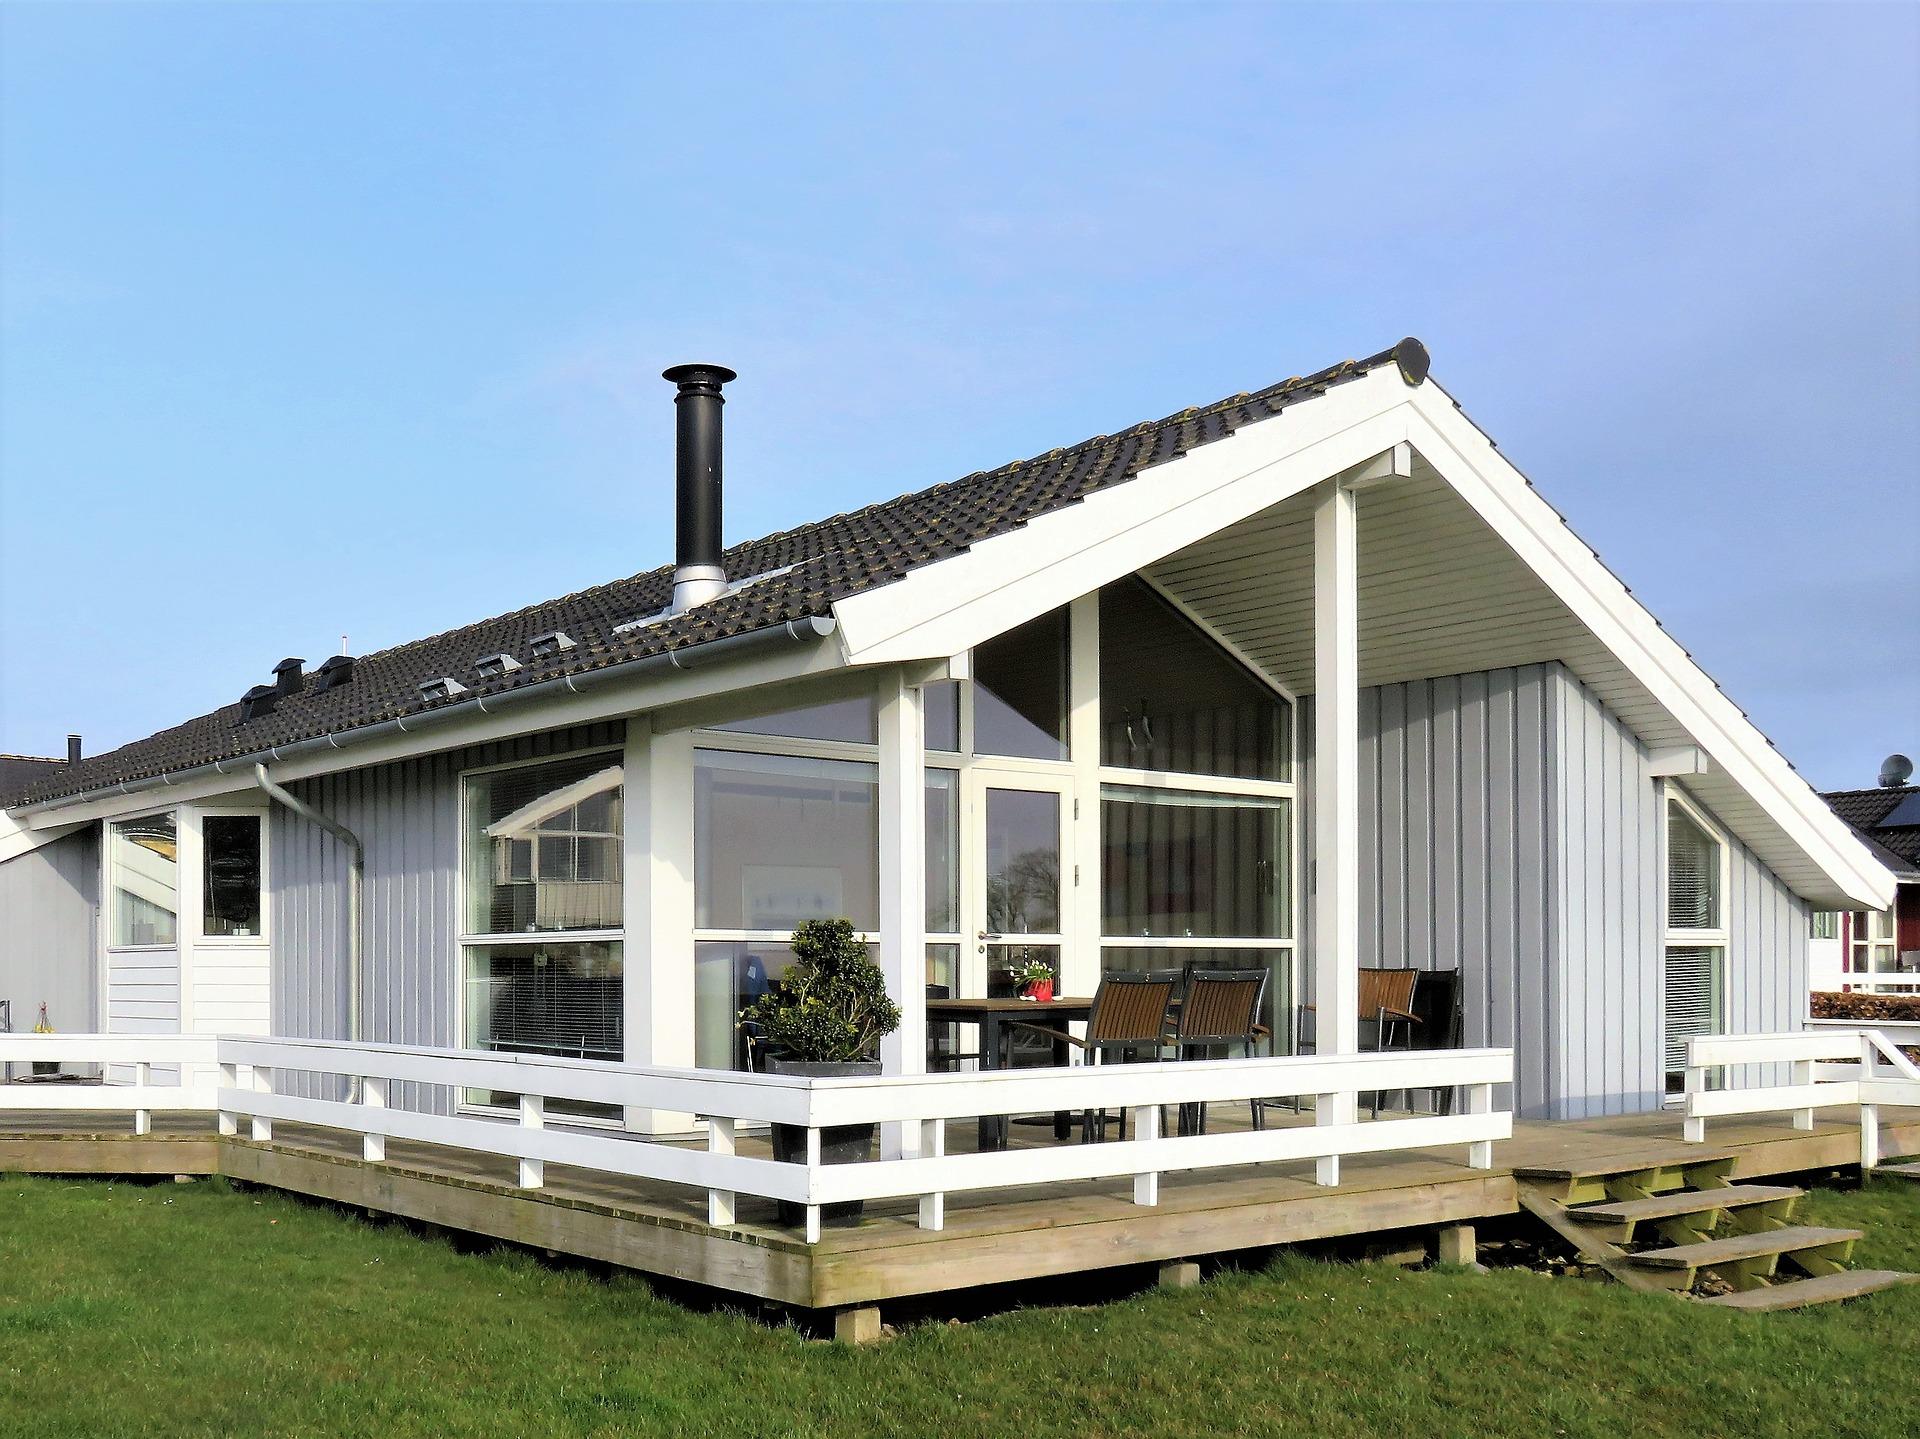 5 tips om de perfecte veranda te creëren #veranda #tuin #wonen